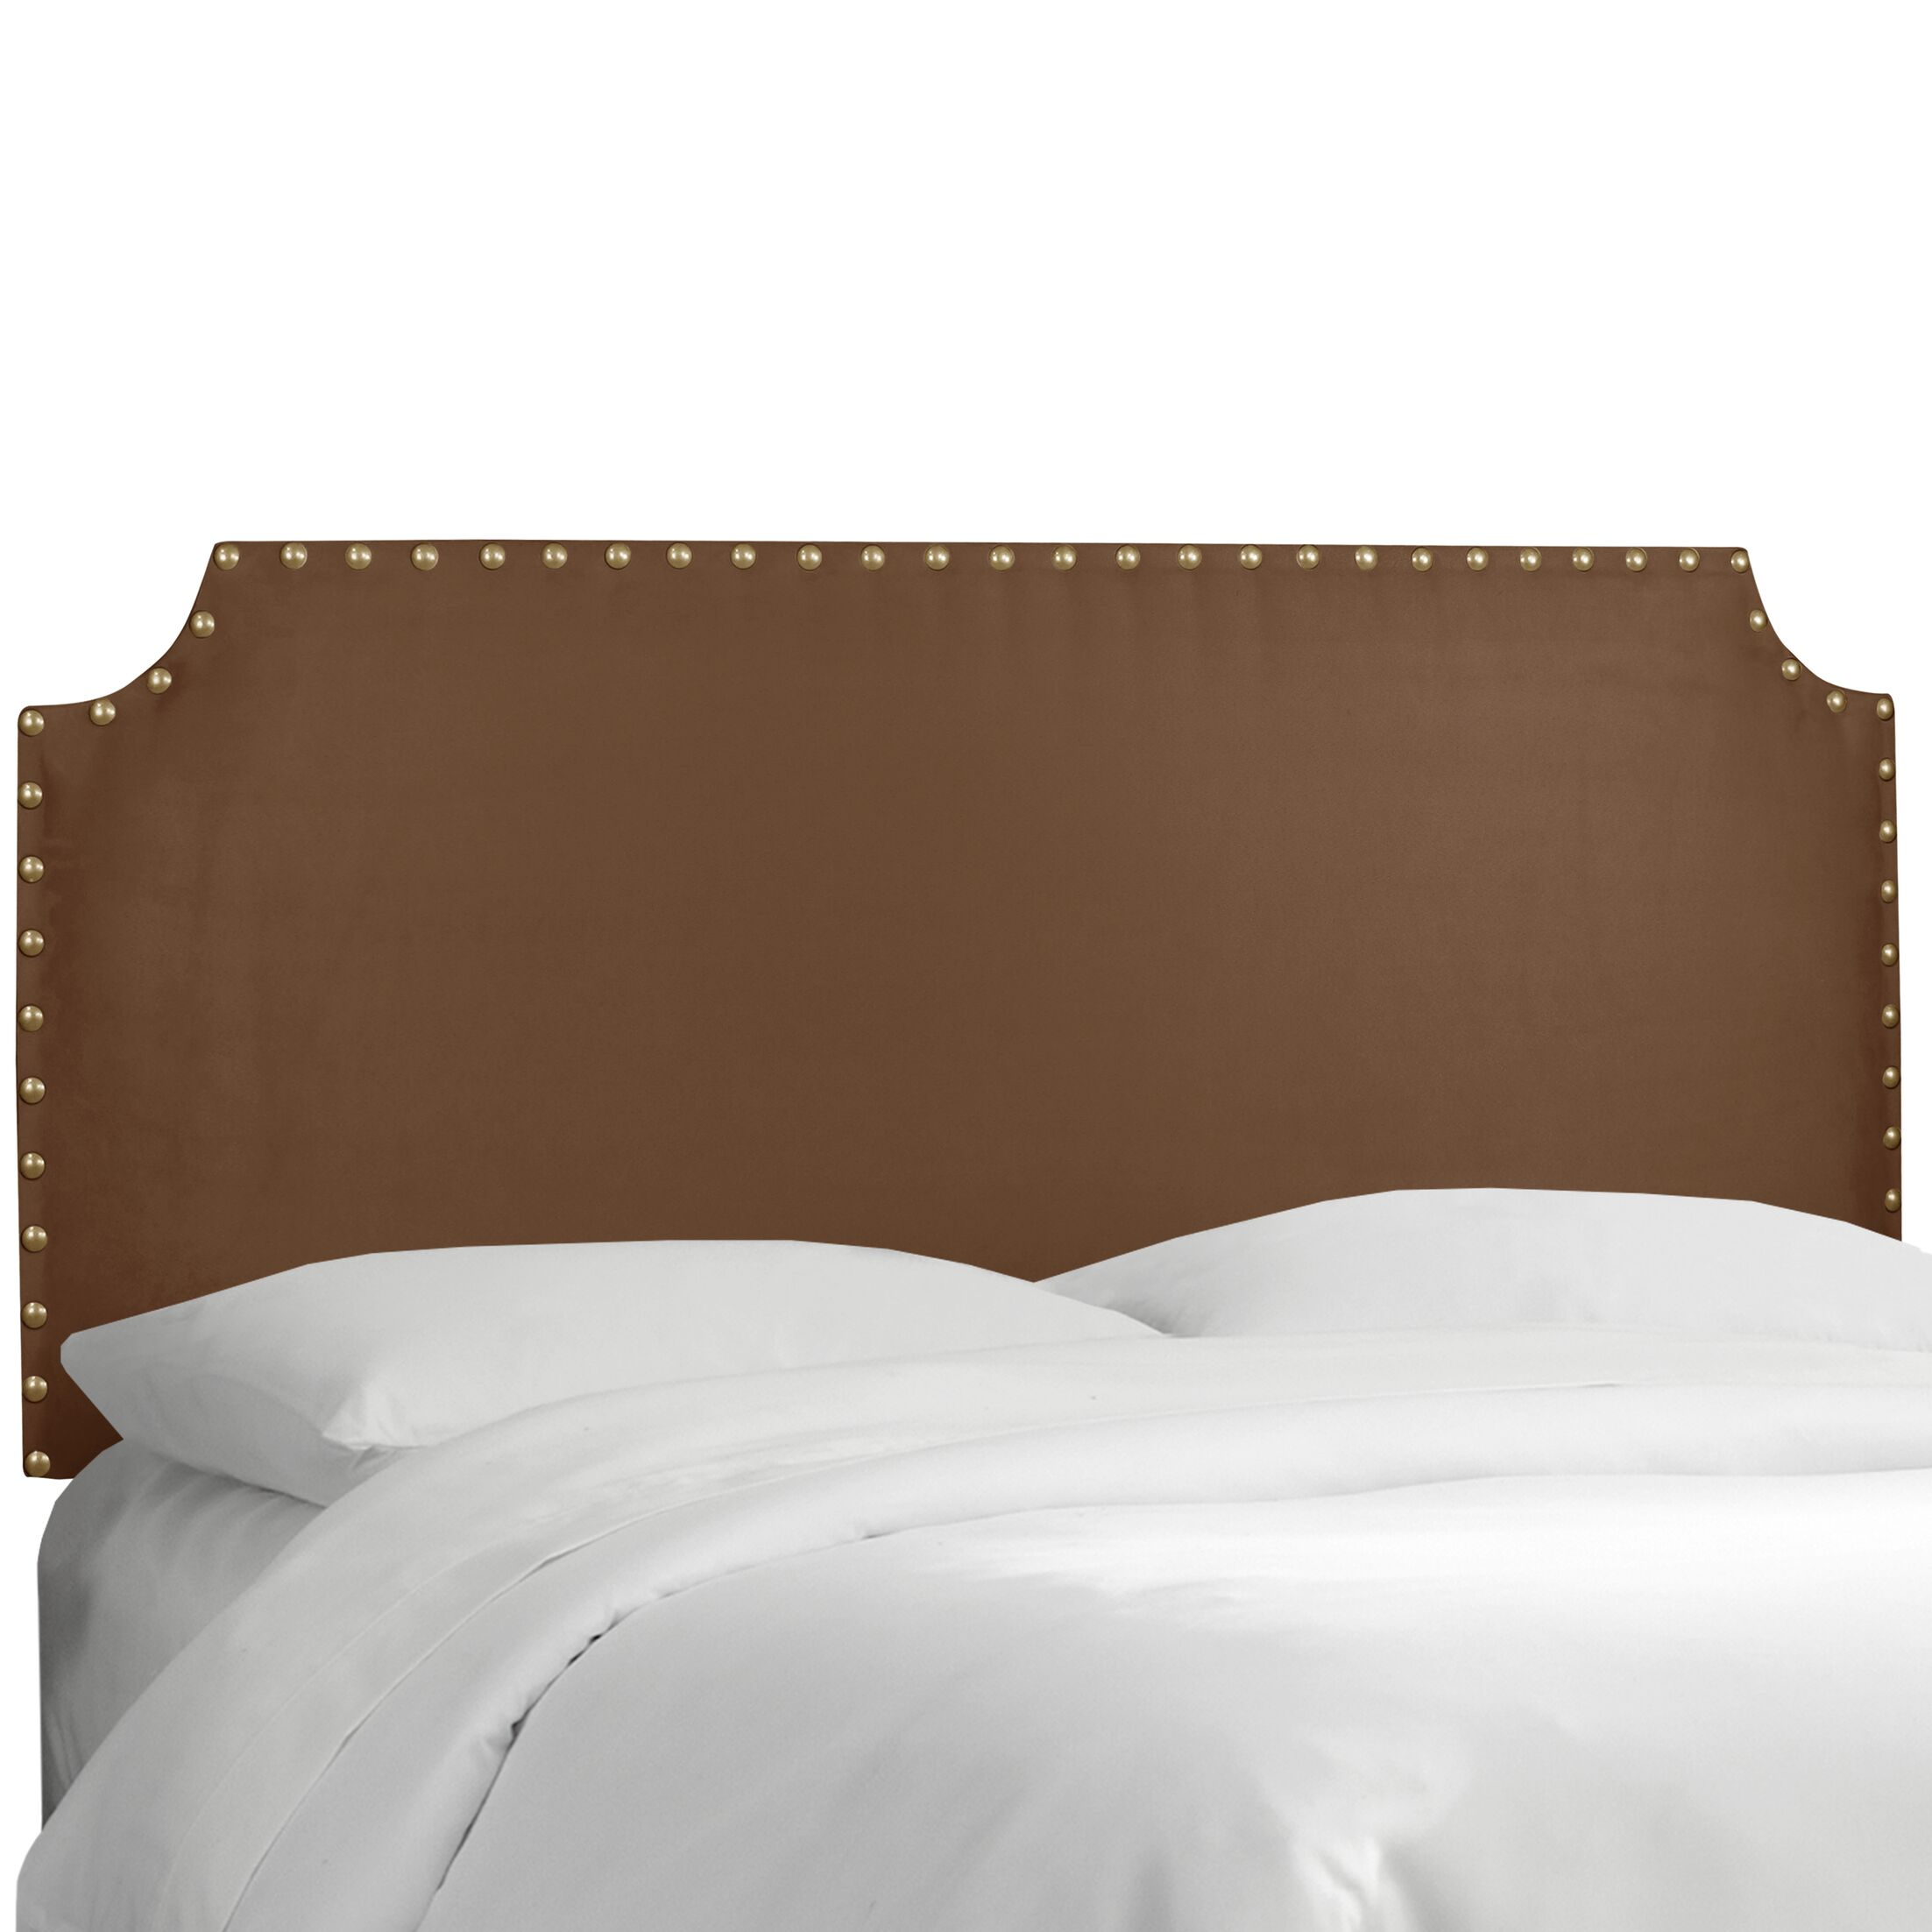 Adelia Upholstered Panel Headboard Size: Full, Upholstery: Premier Chocolate